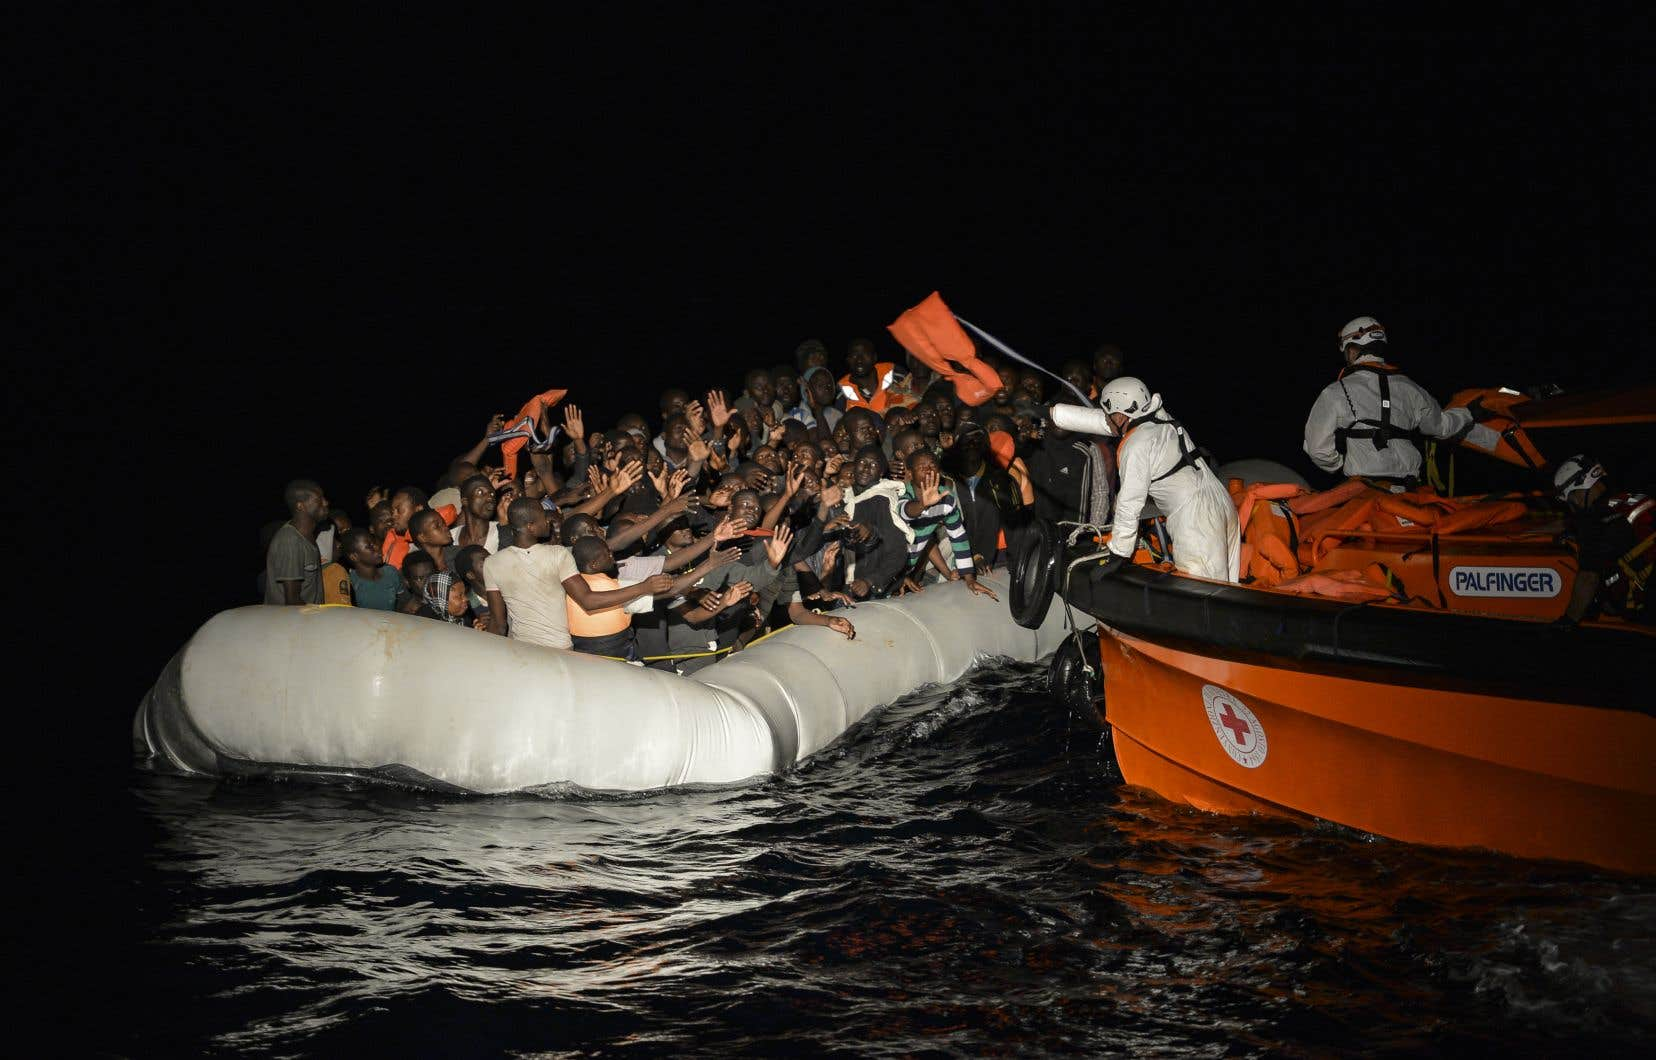 Opération de secours en mer Méditerranée